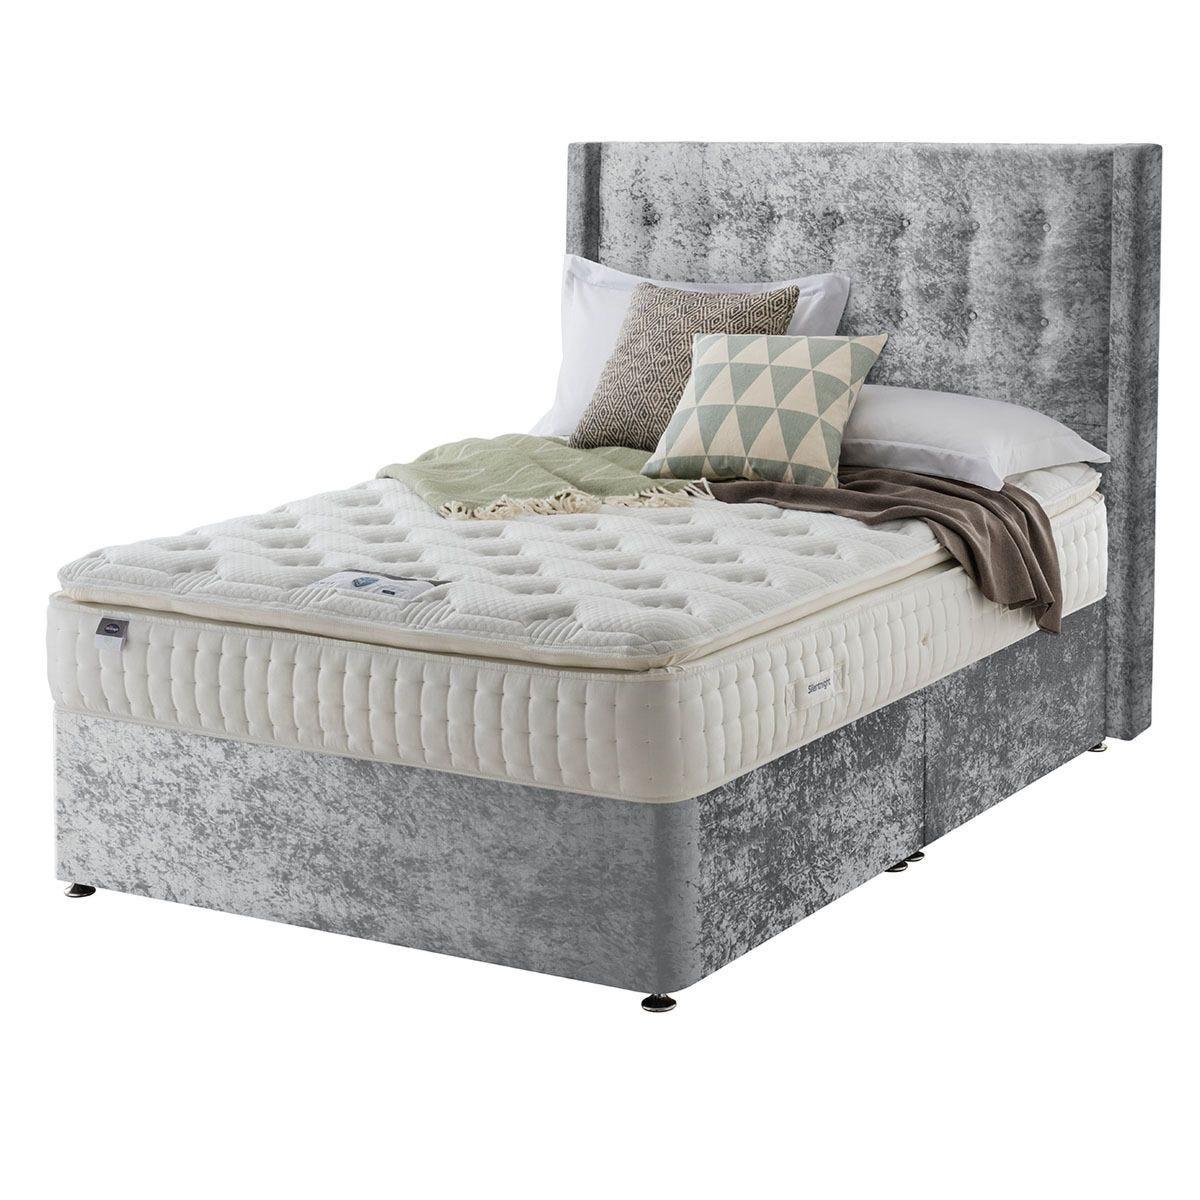 Silentnight Mirapocket Latex 1000 Non Storage Divan Bed - Crushed Velvet Light Grey Double